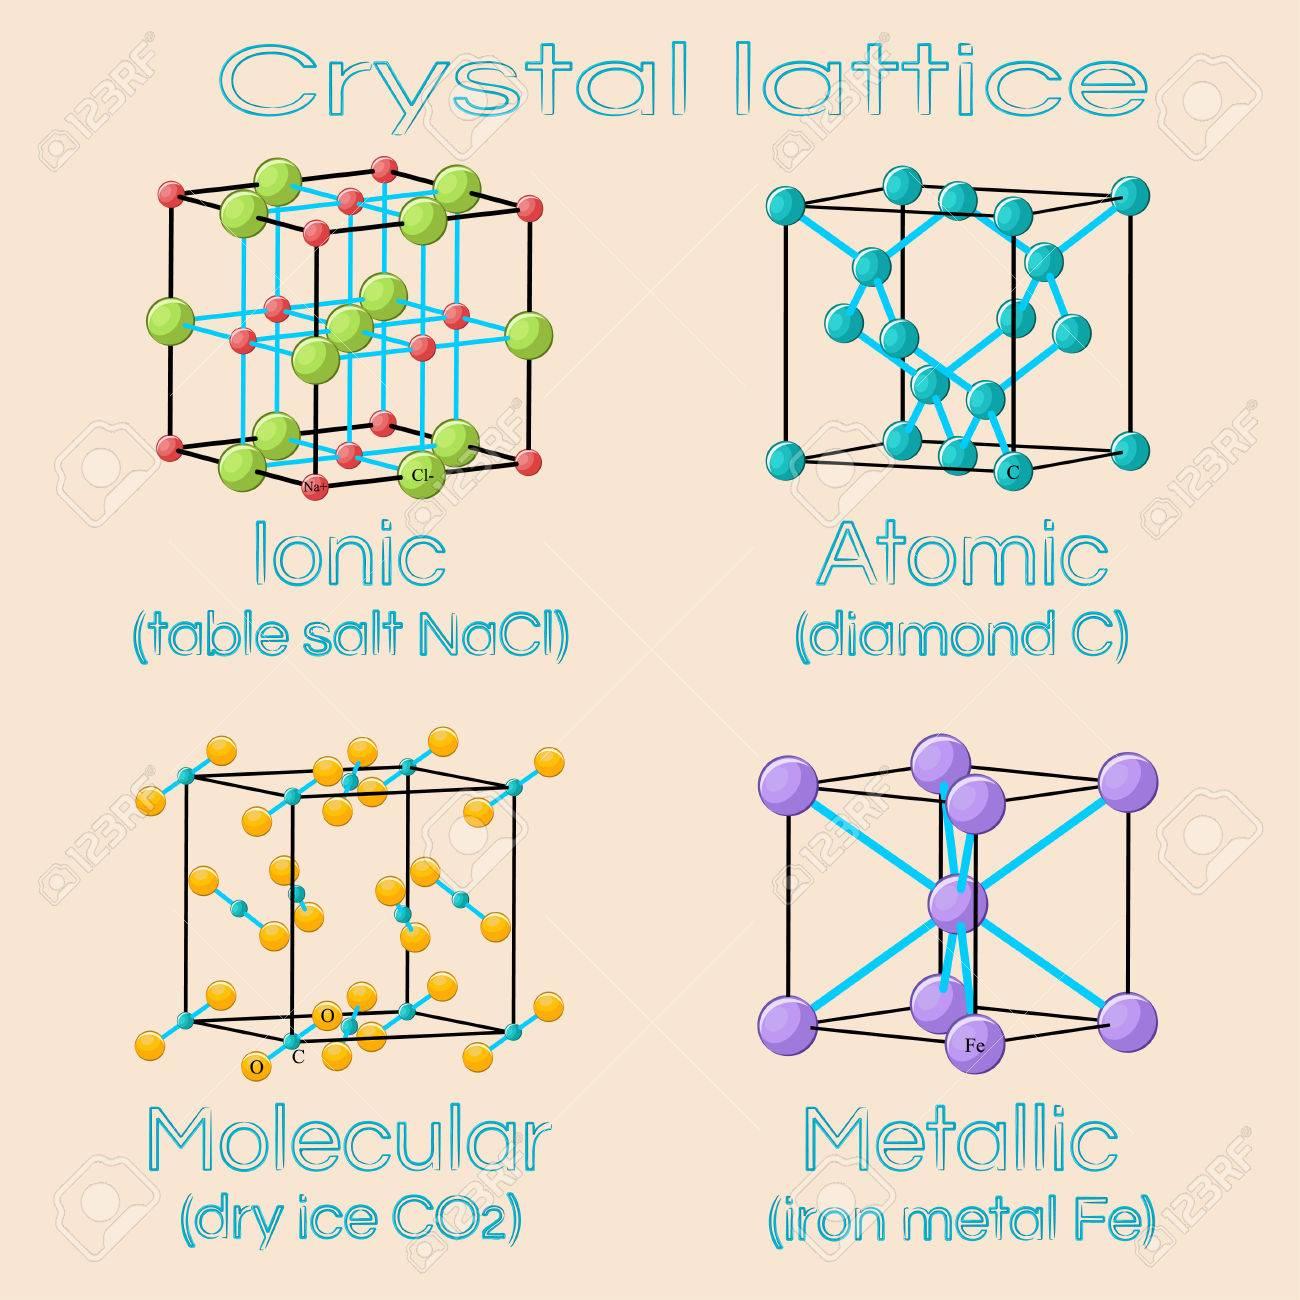 Unit cells of solids crystal lattices  Ionic, atomic, molecular,